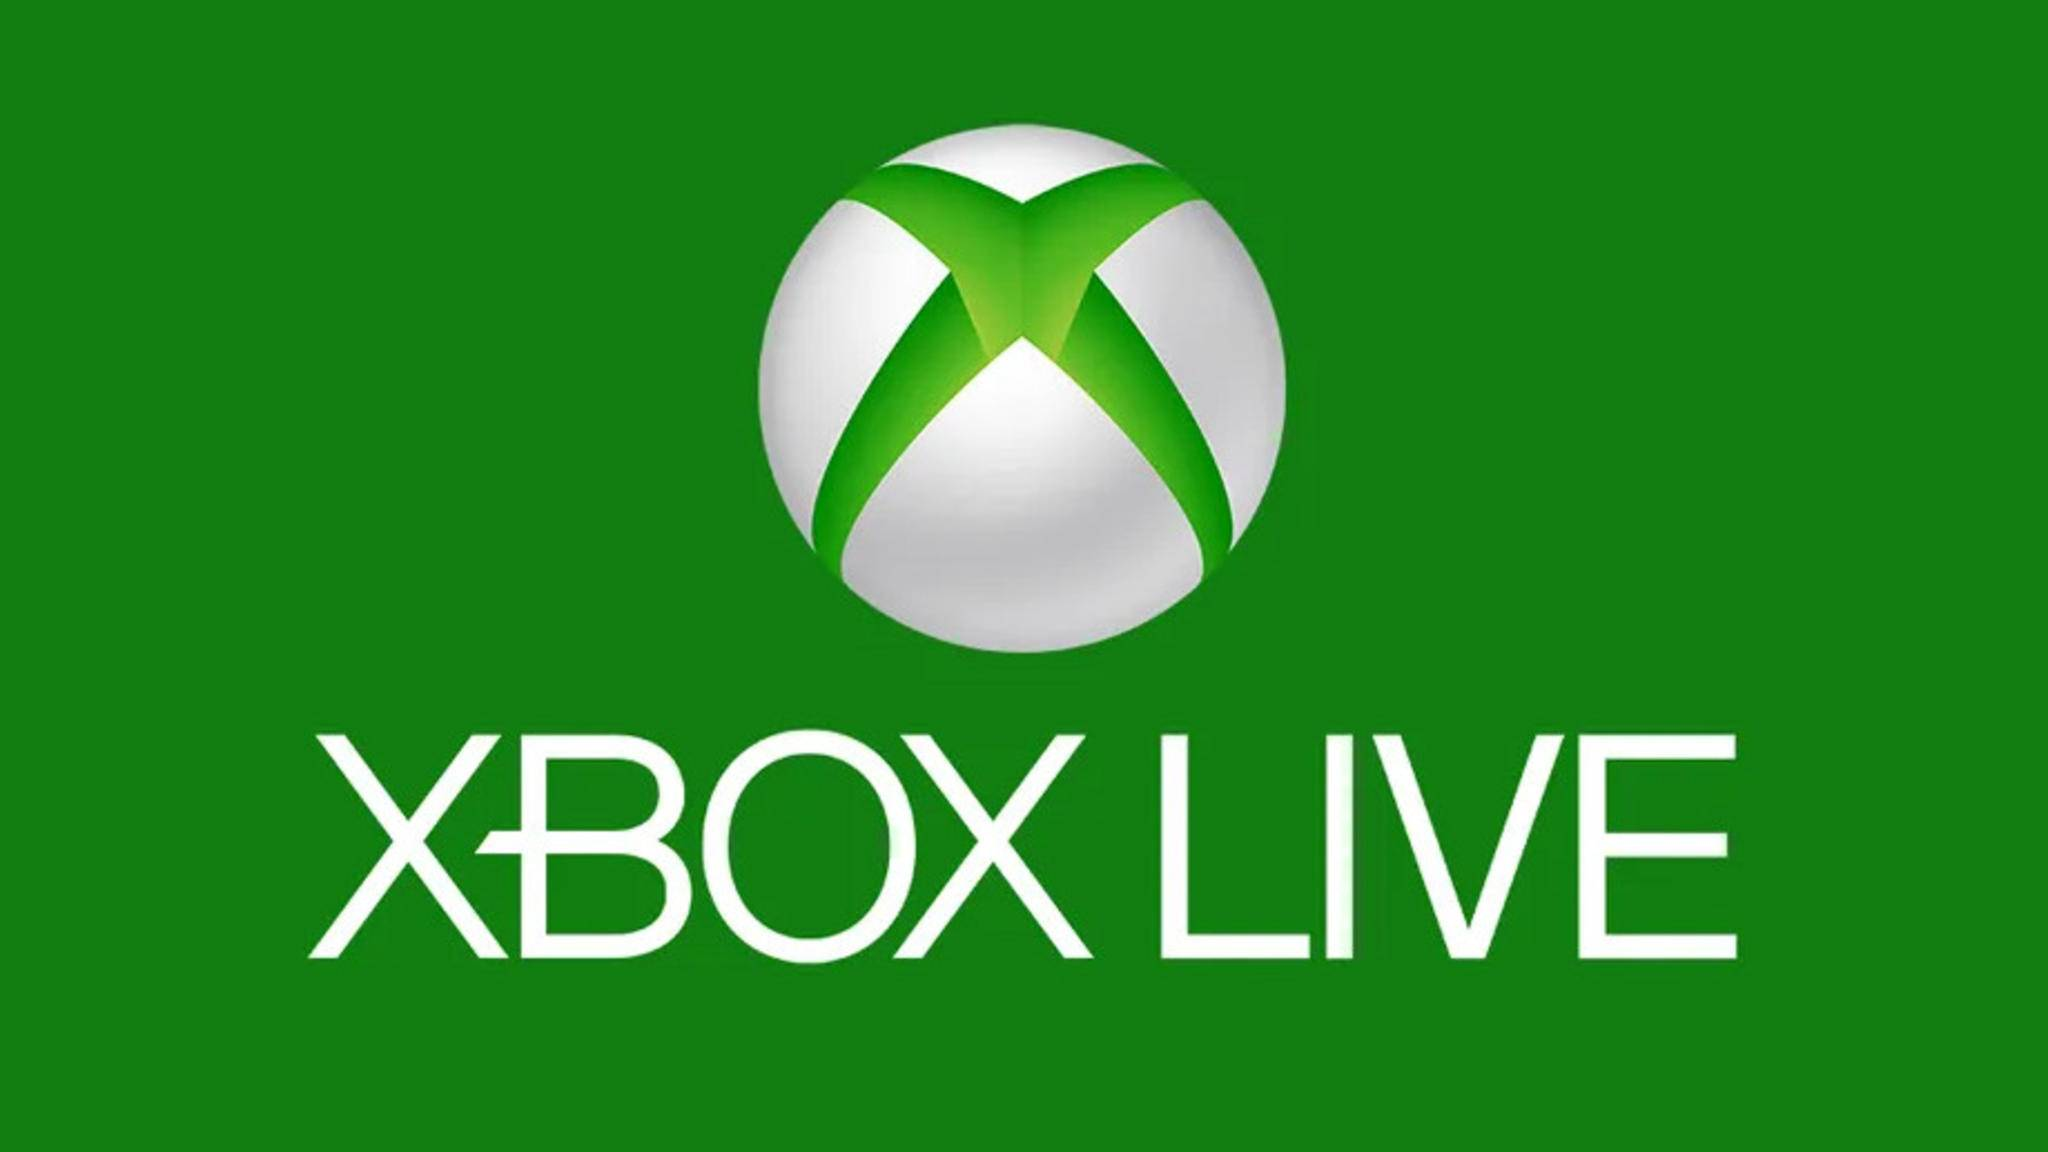 xbox-live-logo-grün